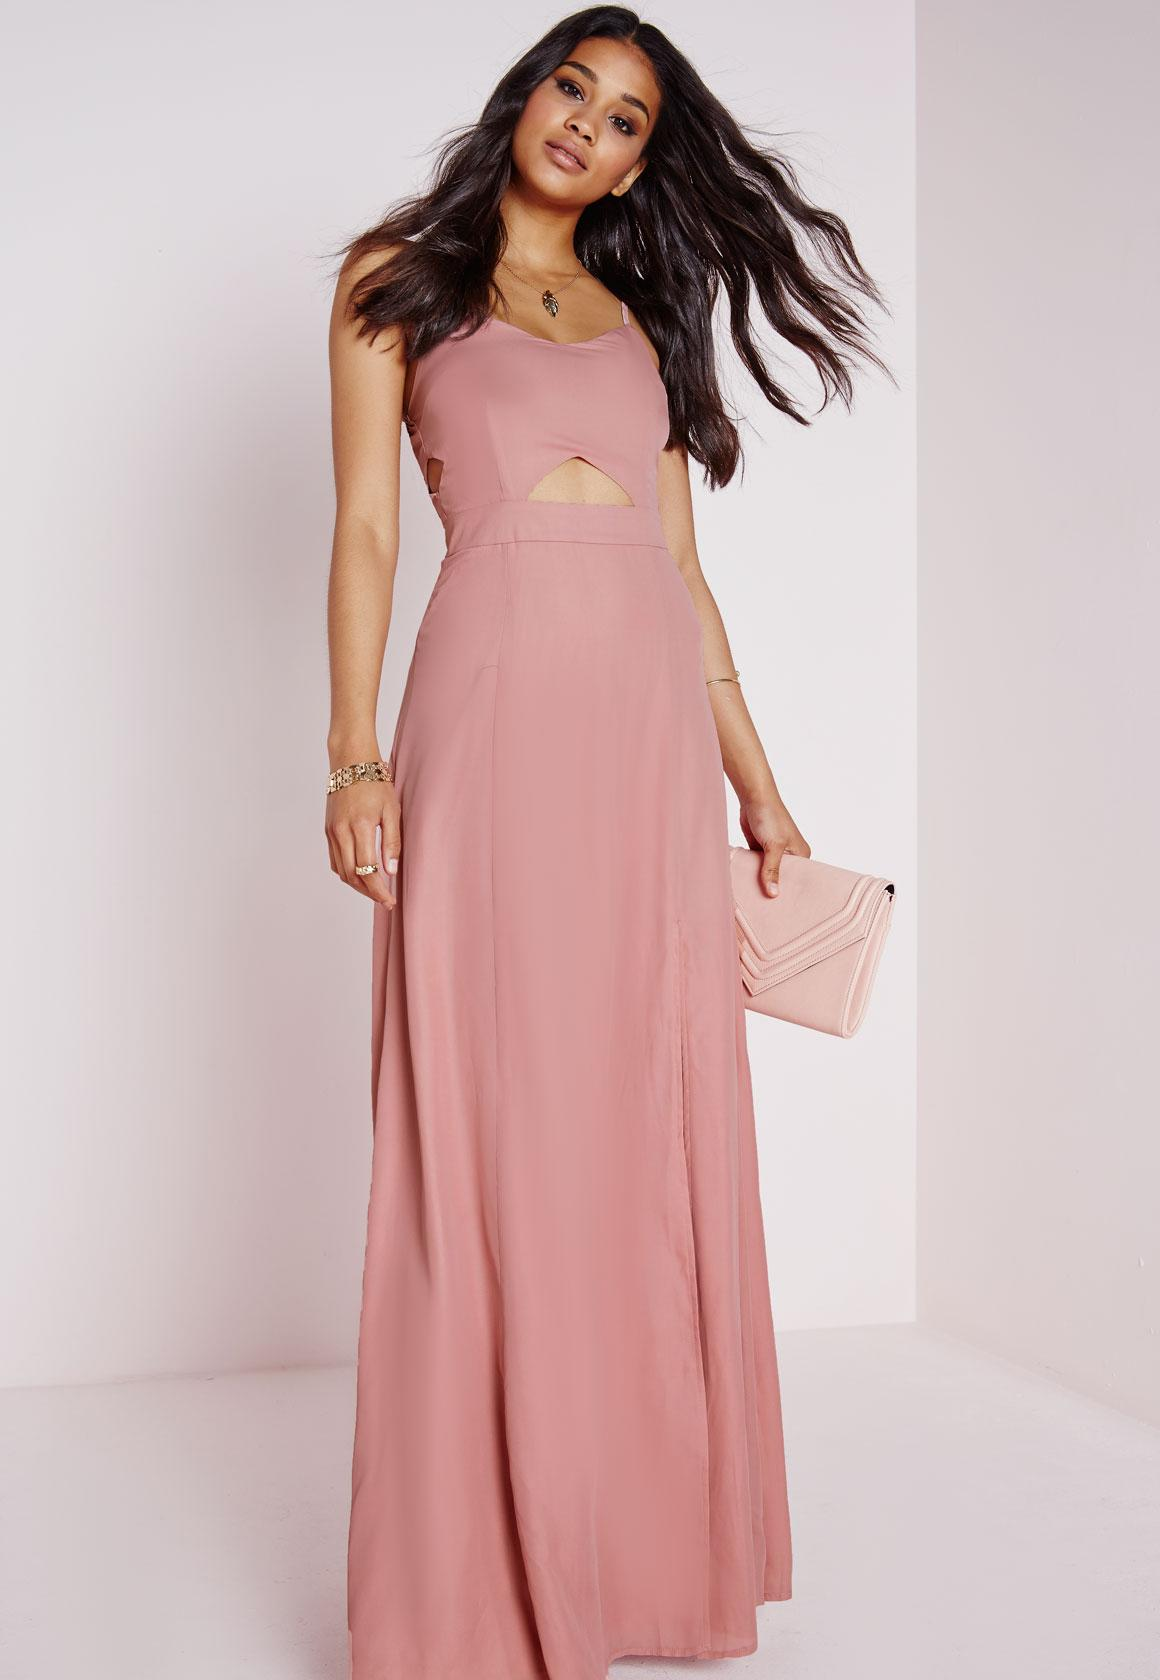 Crepe Bralet Maxi Dress Dusky Pink   Missguided